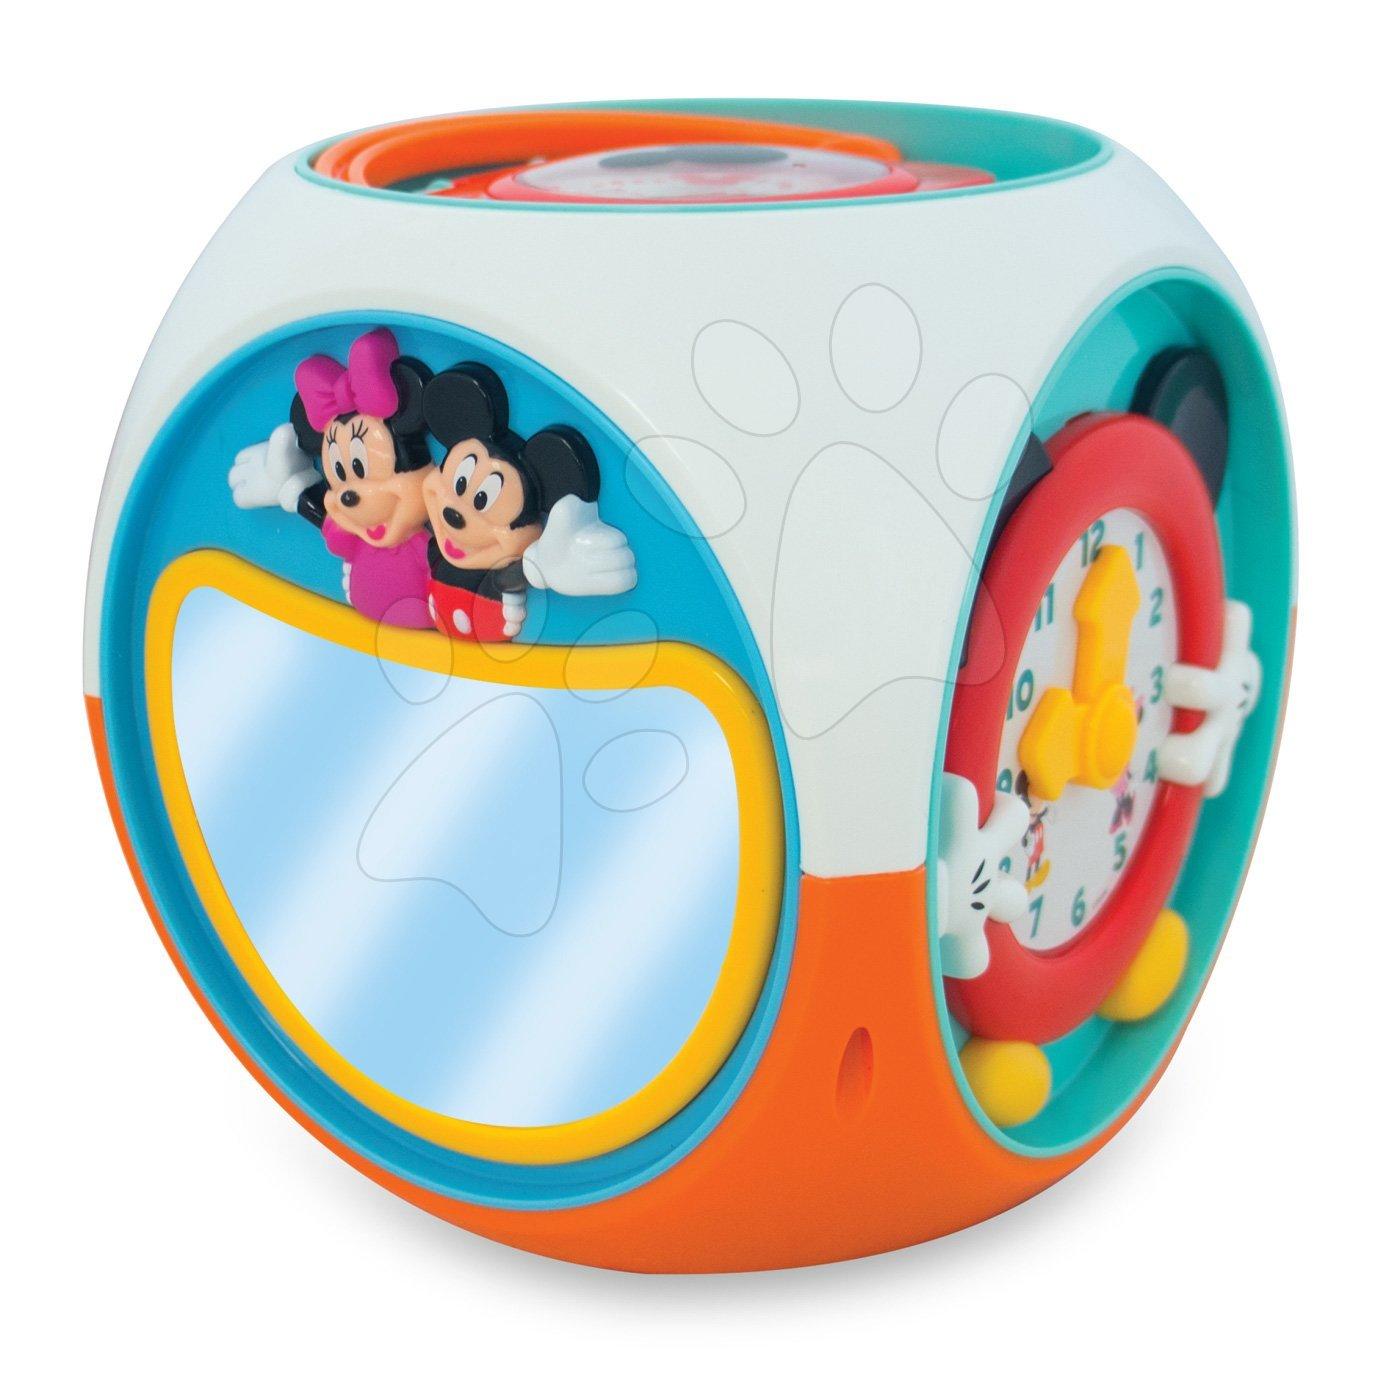 Interaktivna kocka Mickey Mouse Kiddieland z zvoki in lučko od 12 mes